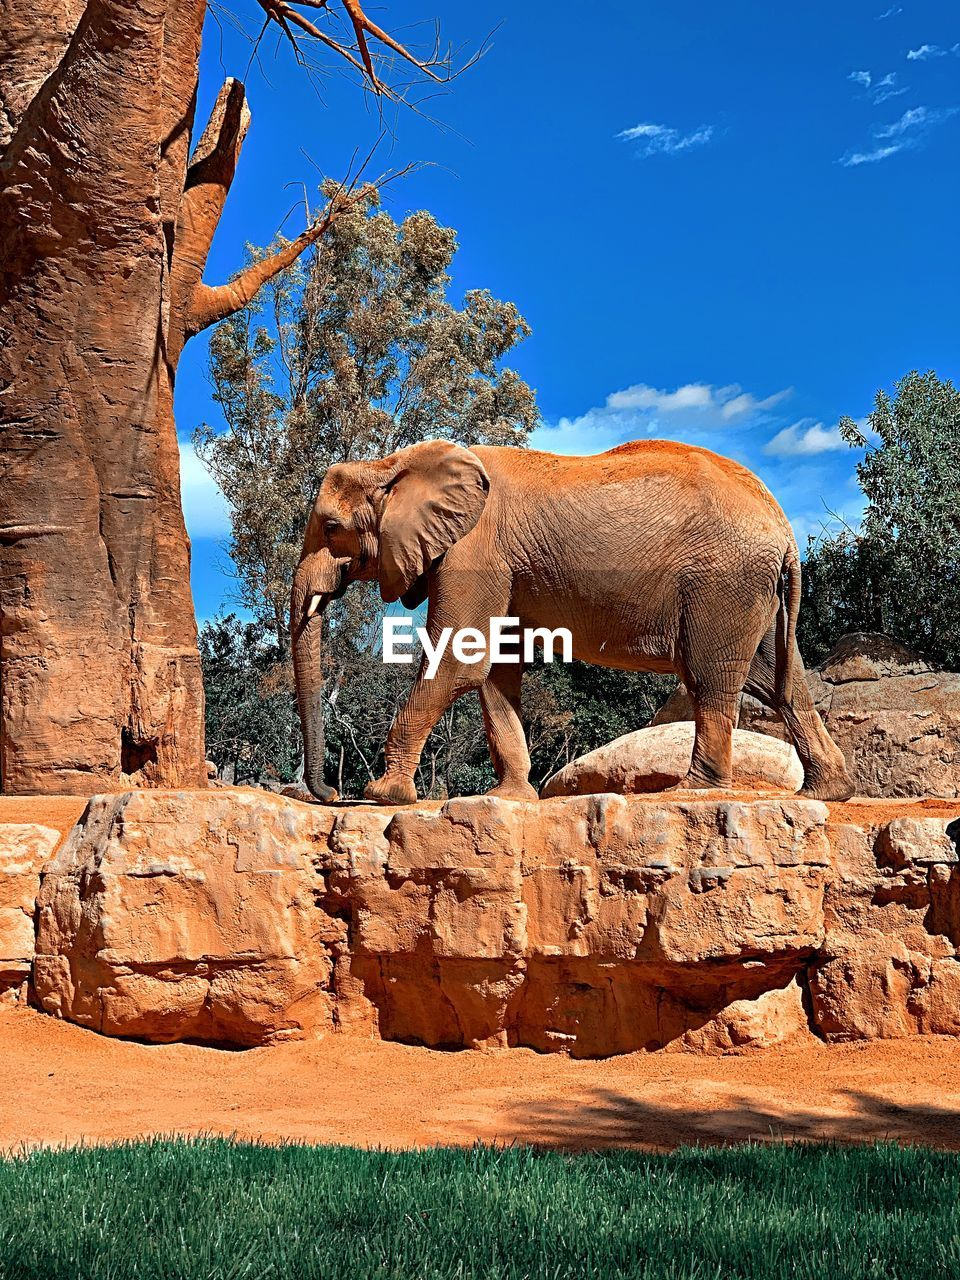 ELEPHANT STANDING ON ROCK